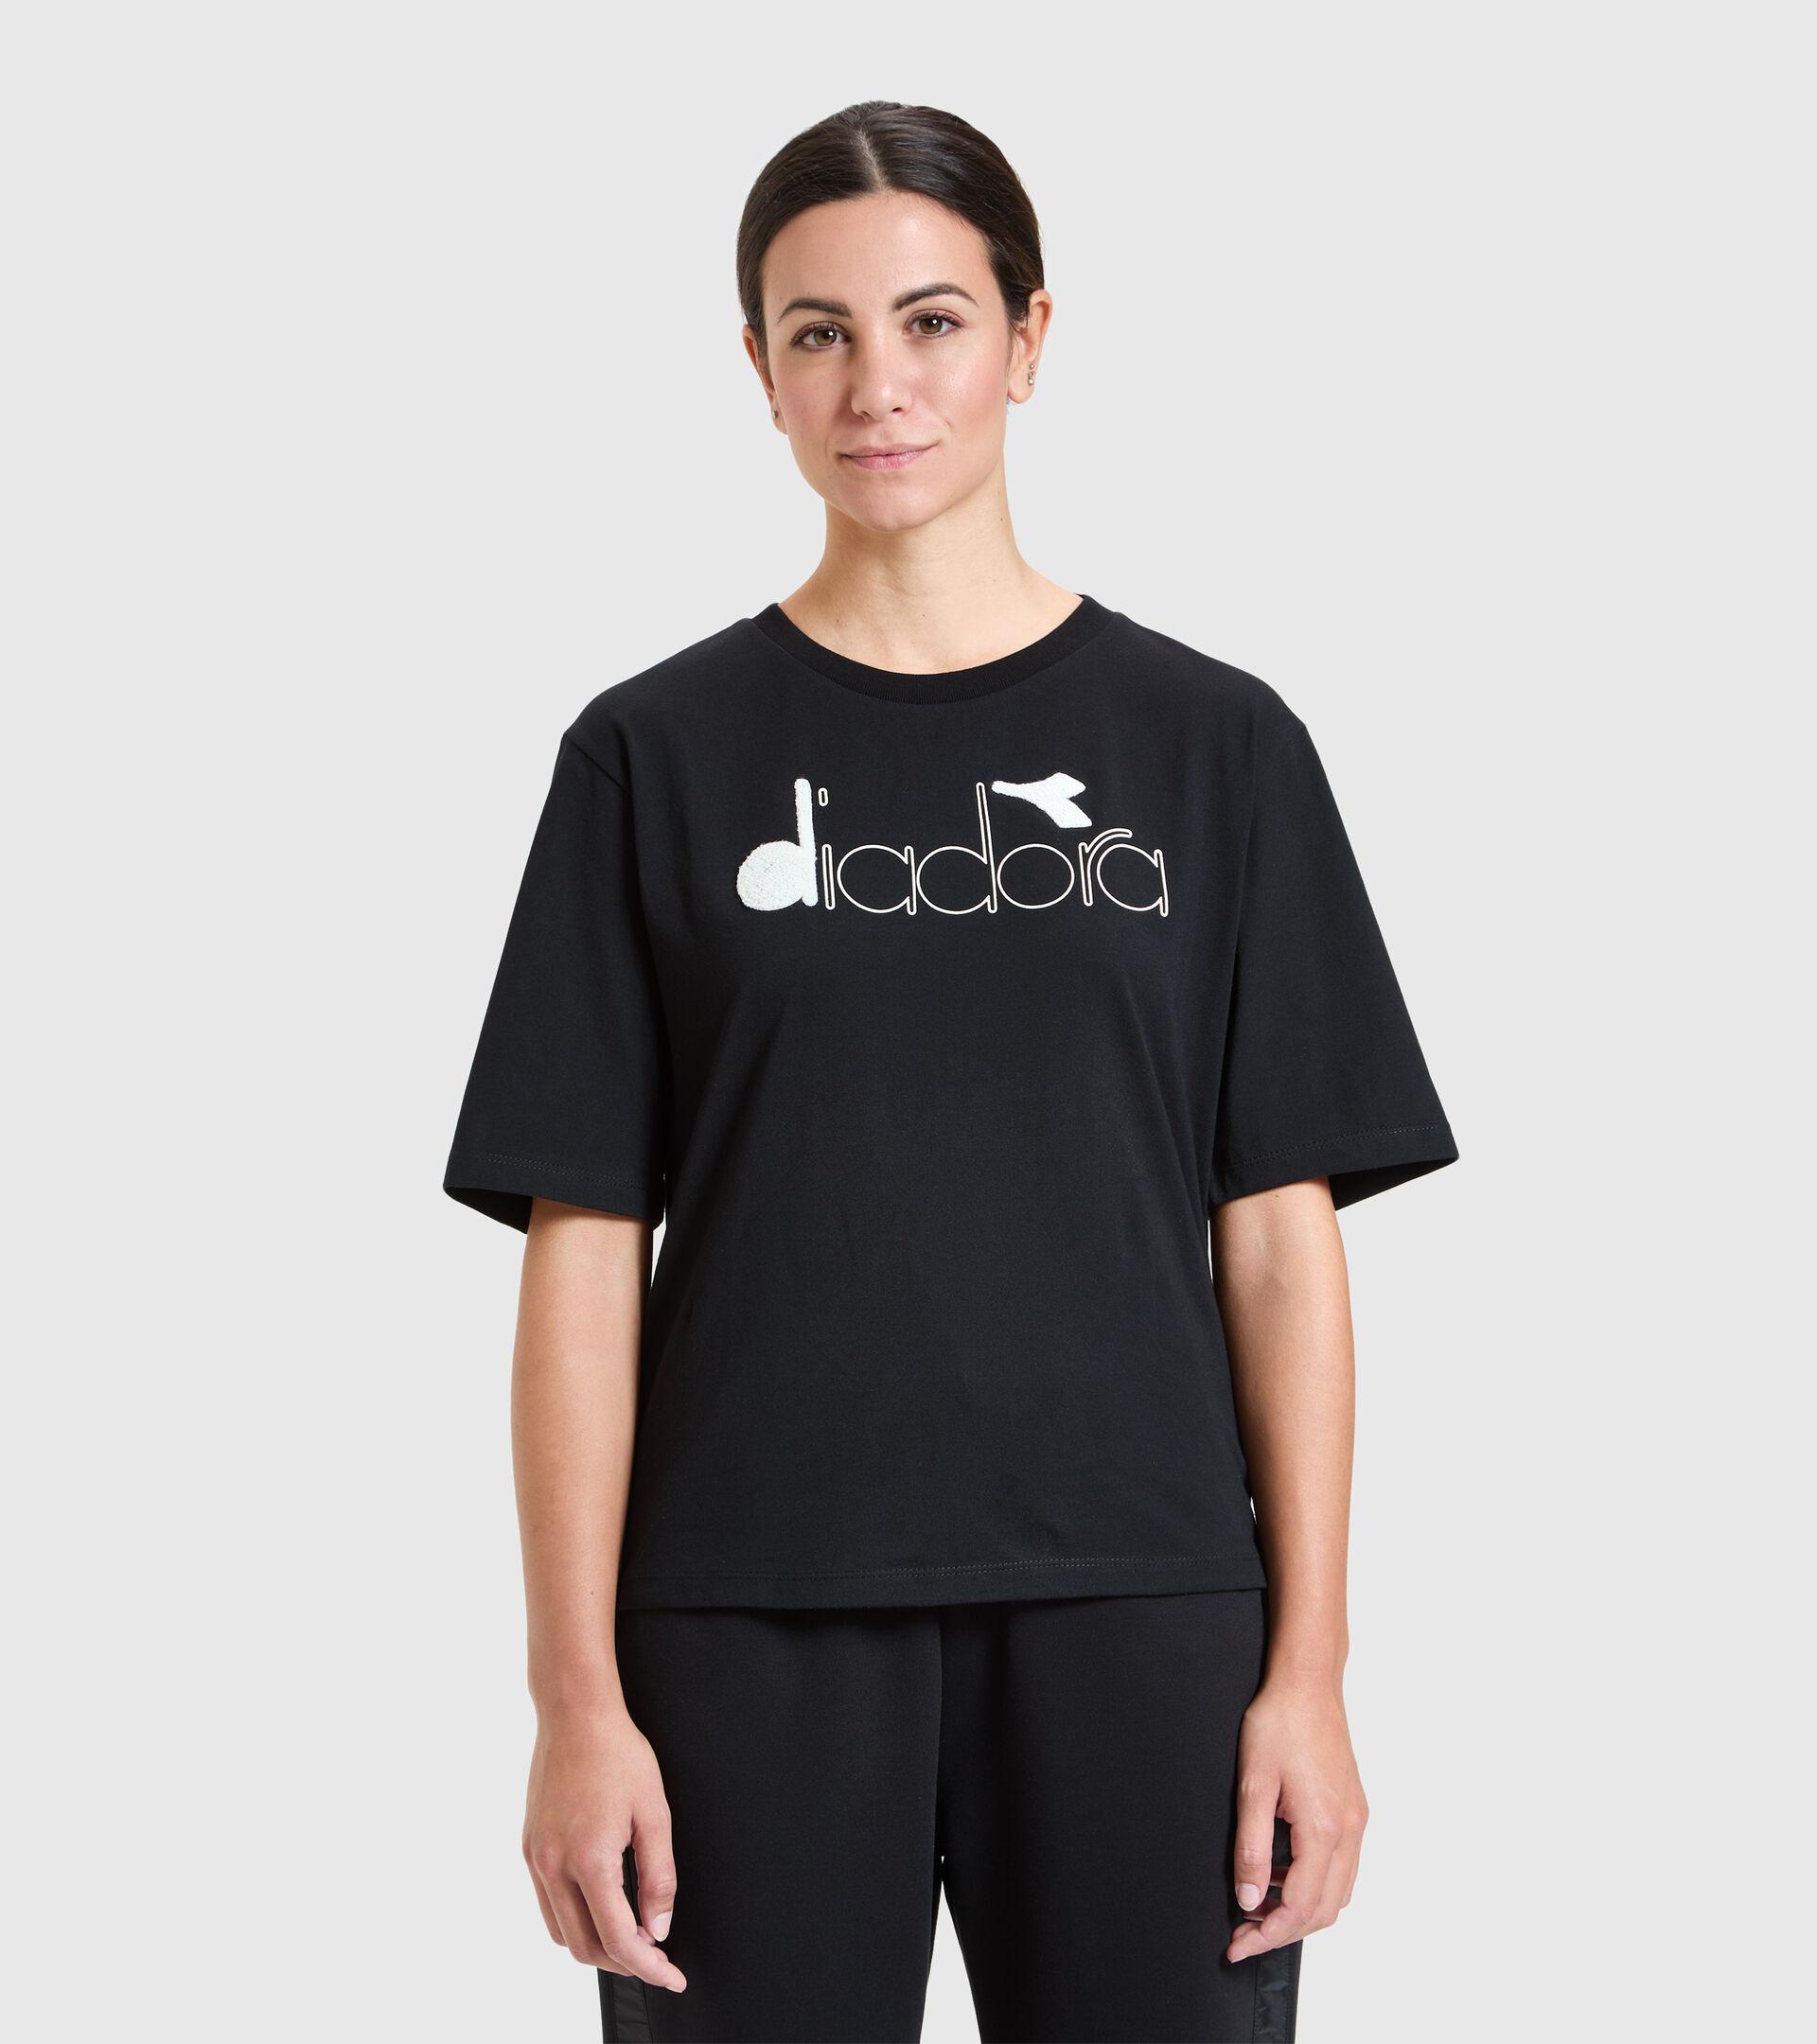 Camiseta - Mujer L. T-SHIRT SS URBANITY NEGRO - Diadora